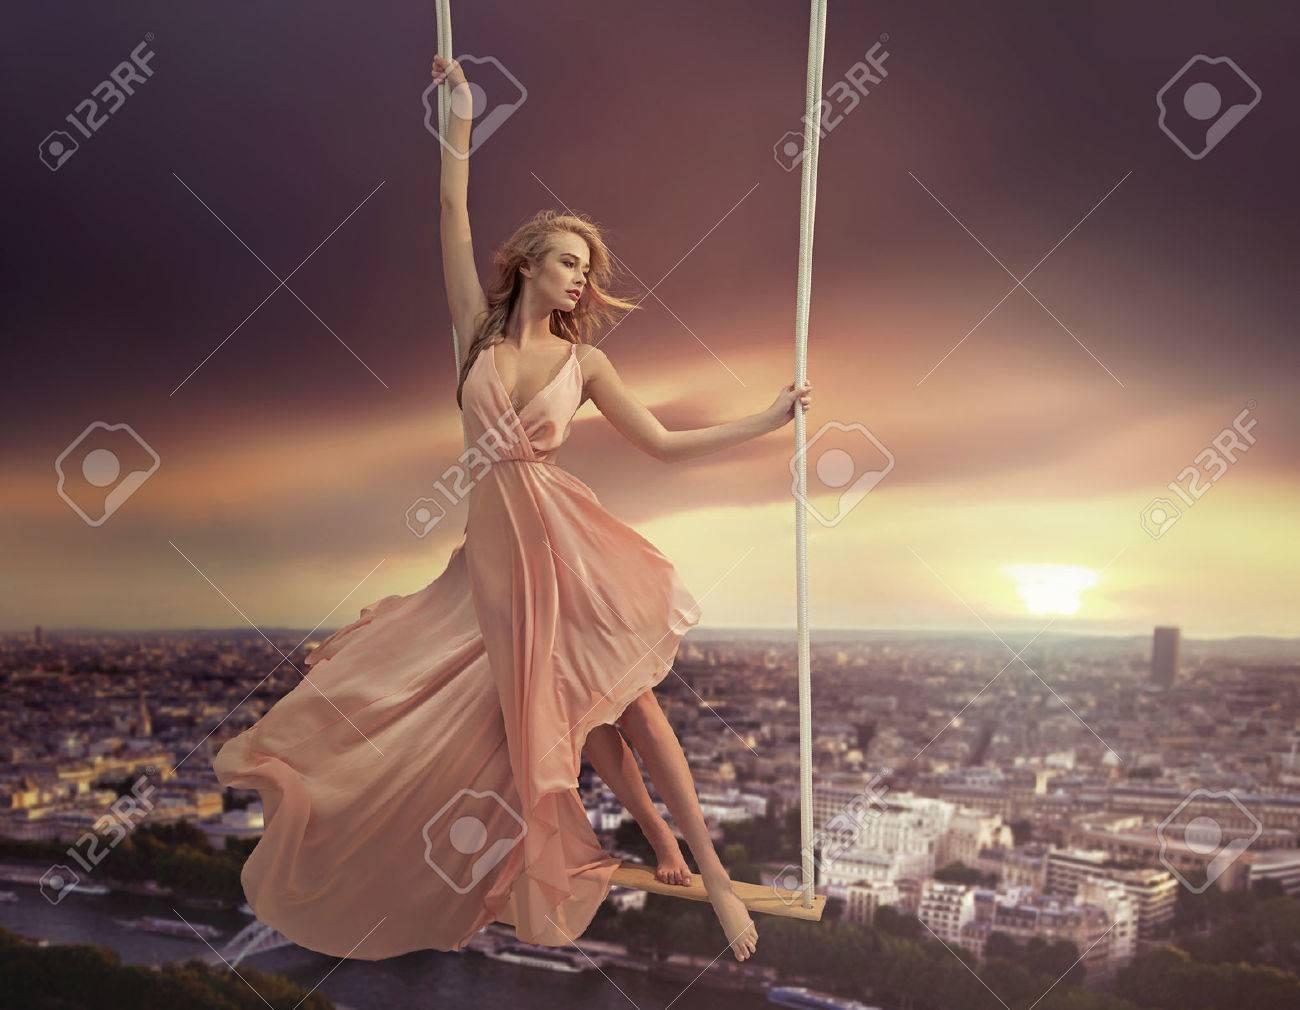 Adorable woman dangling above the city Archivio Fotografico - 51039848